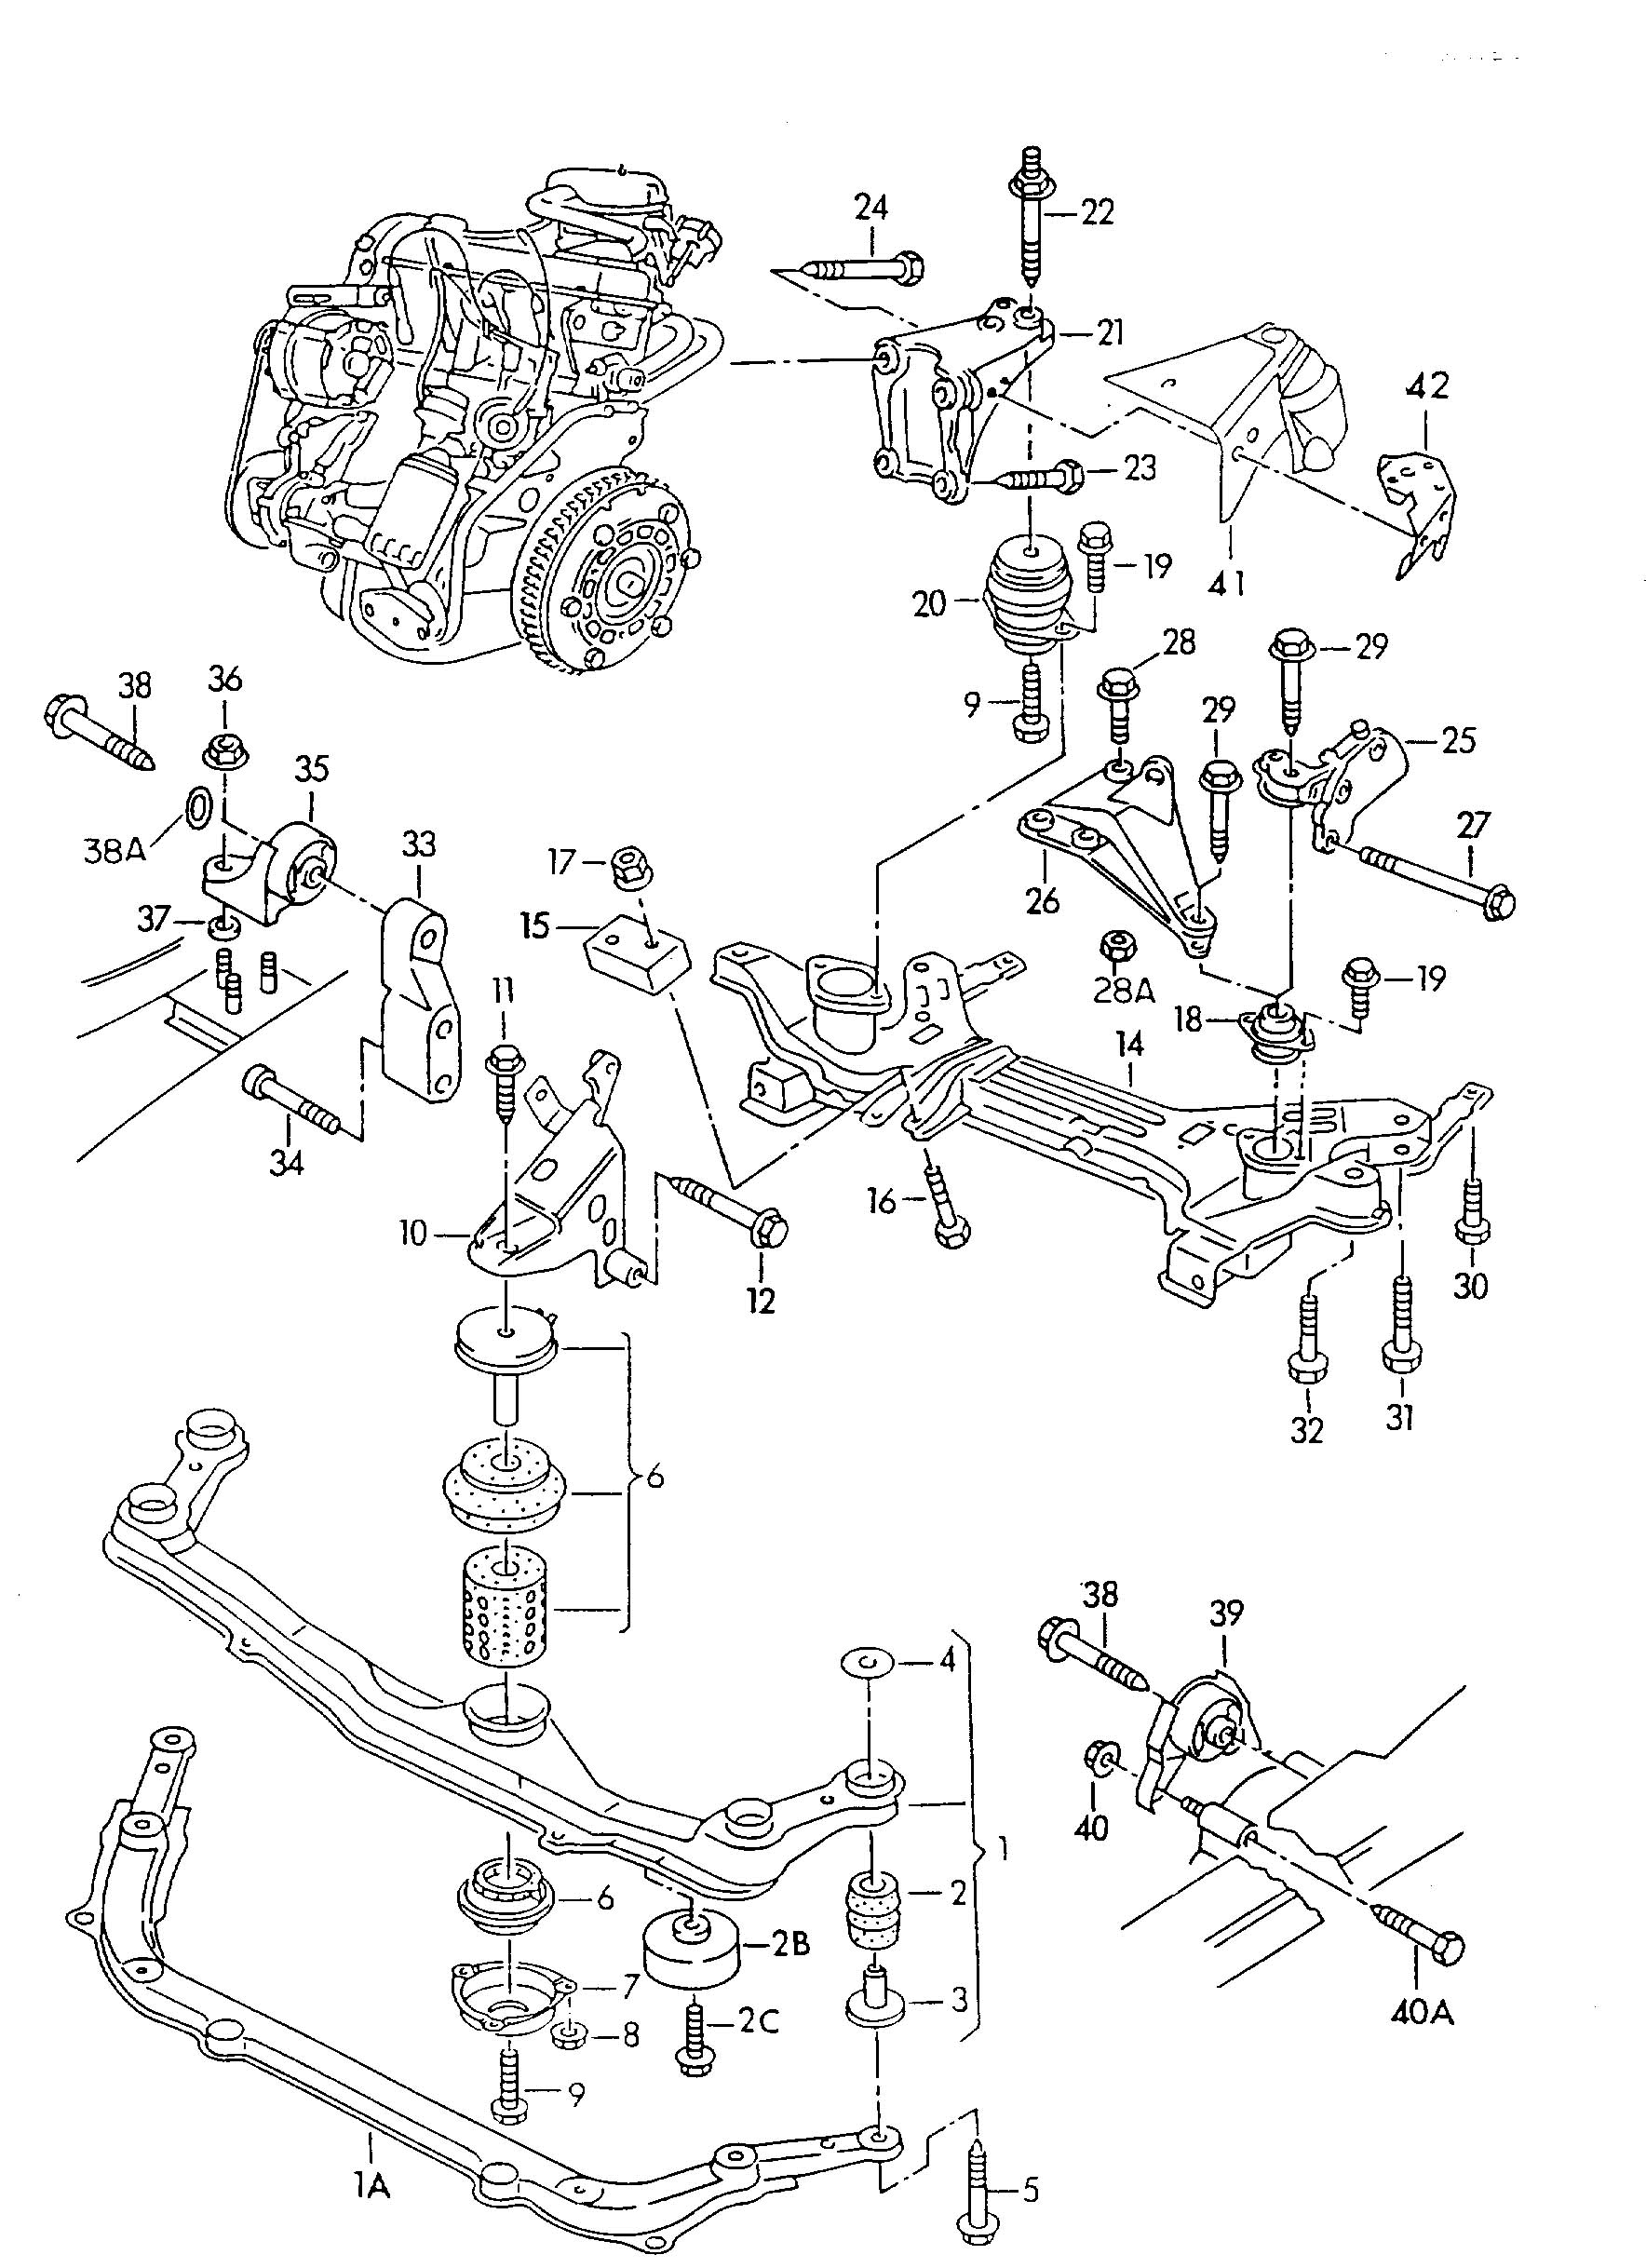 ZH_6542] 2000 Jetta 2 0 Engine Diagram Download DiagramPapxe Xero Mohammedshrine Librar Wiring 101